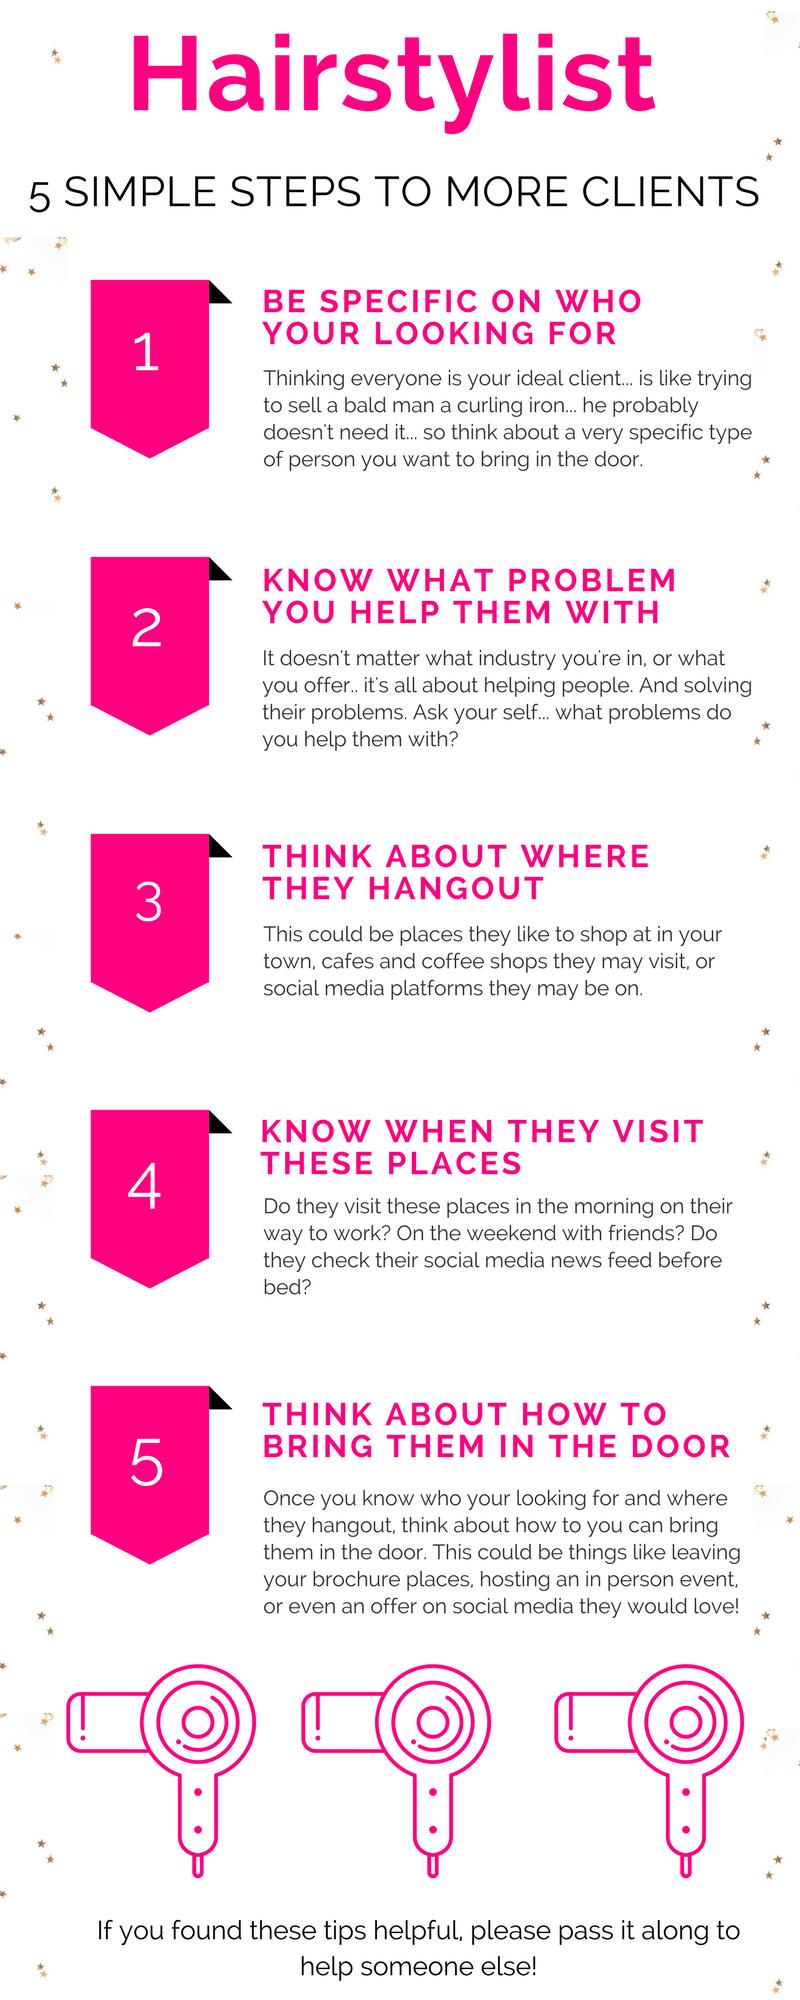 Hairstylist and Salon Marketing ideas for social media  Salon